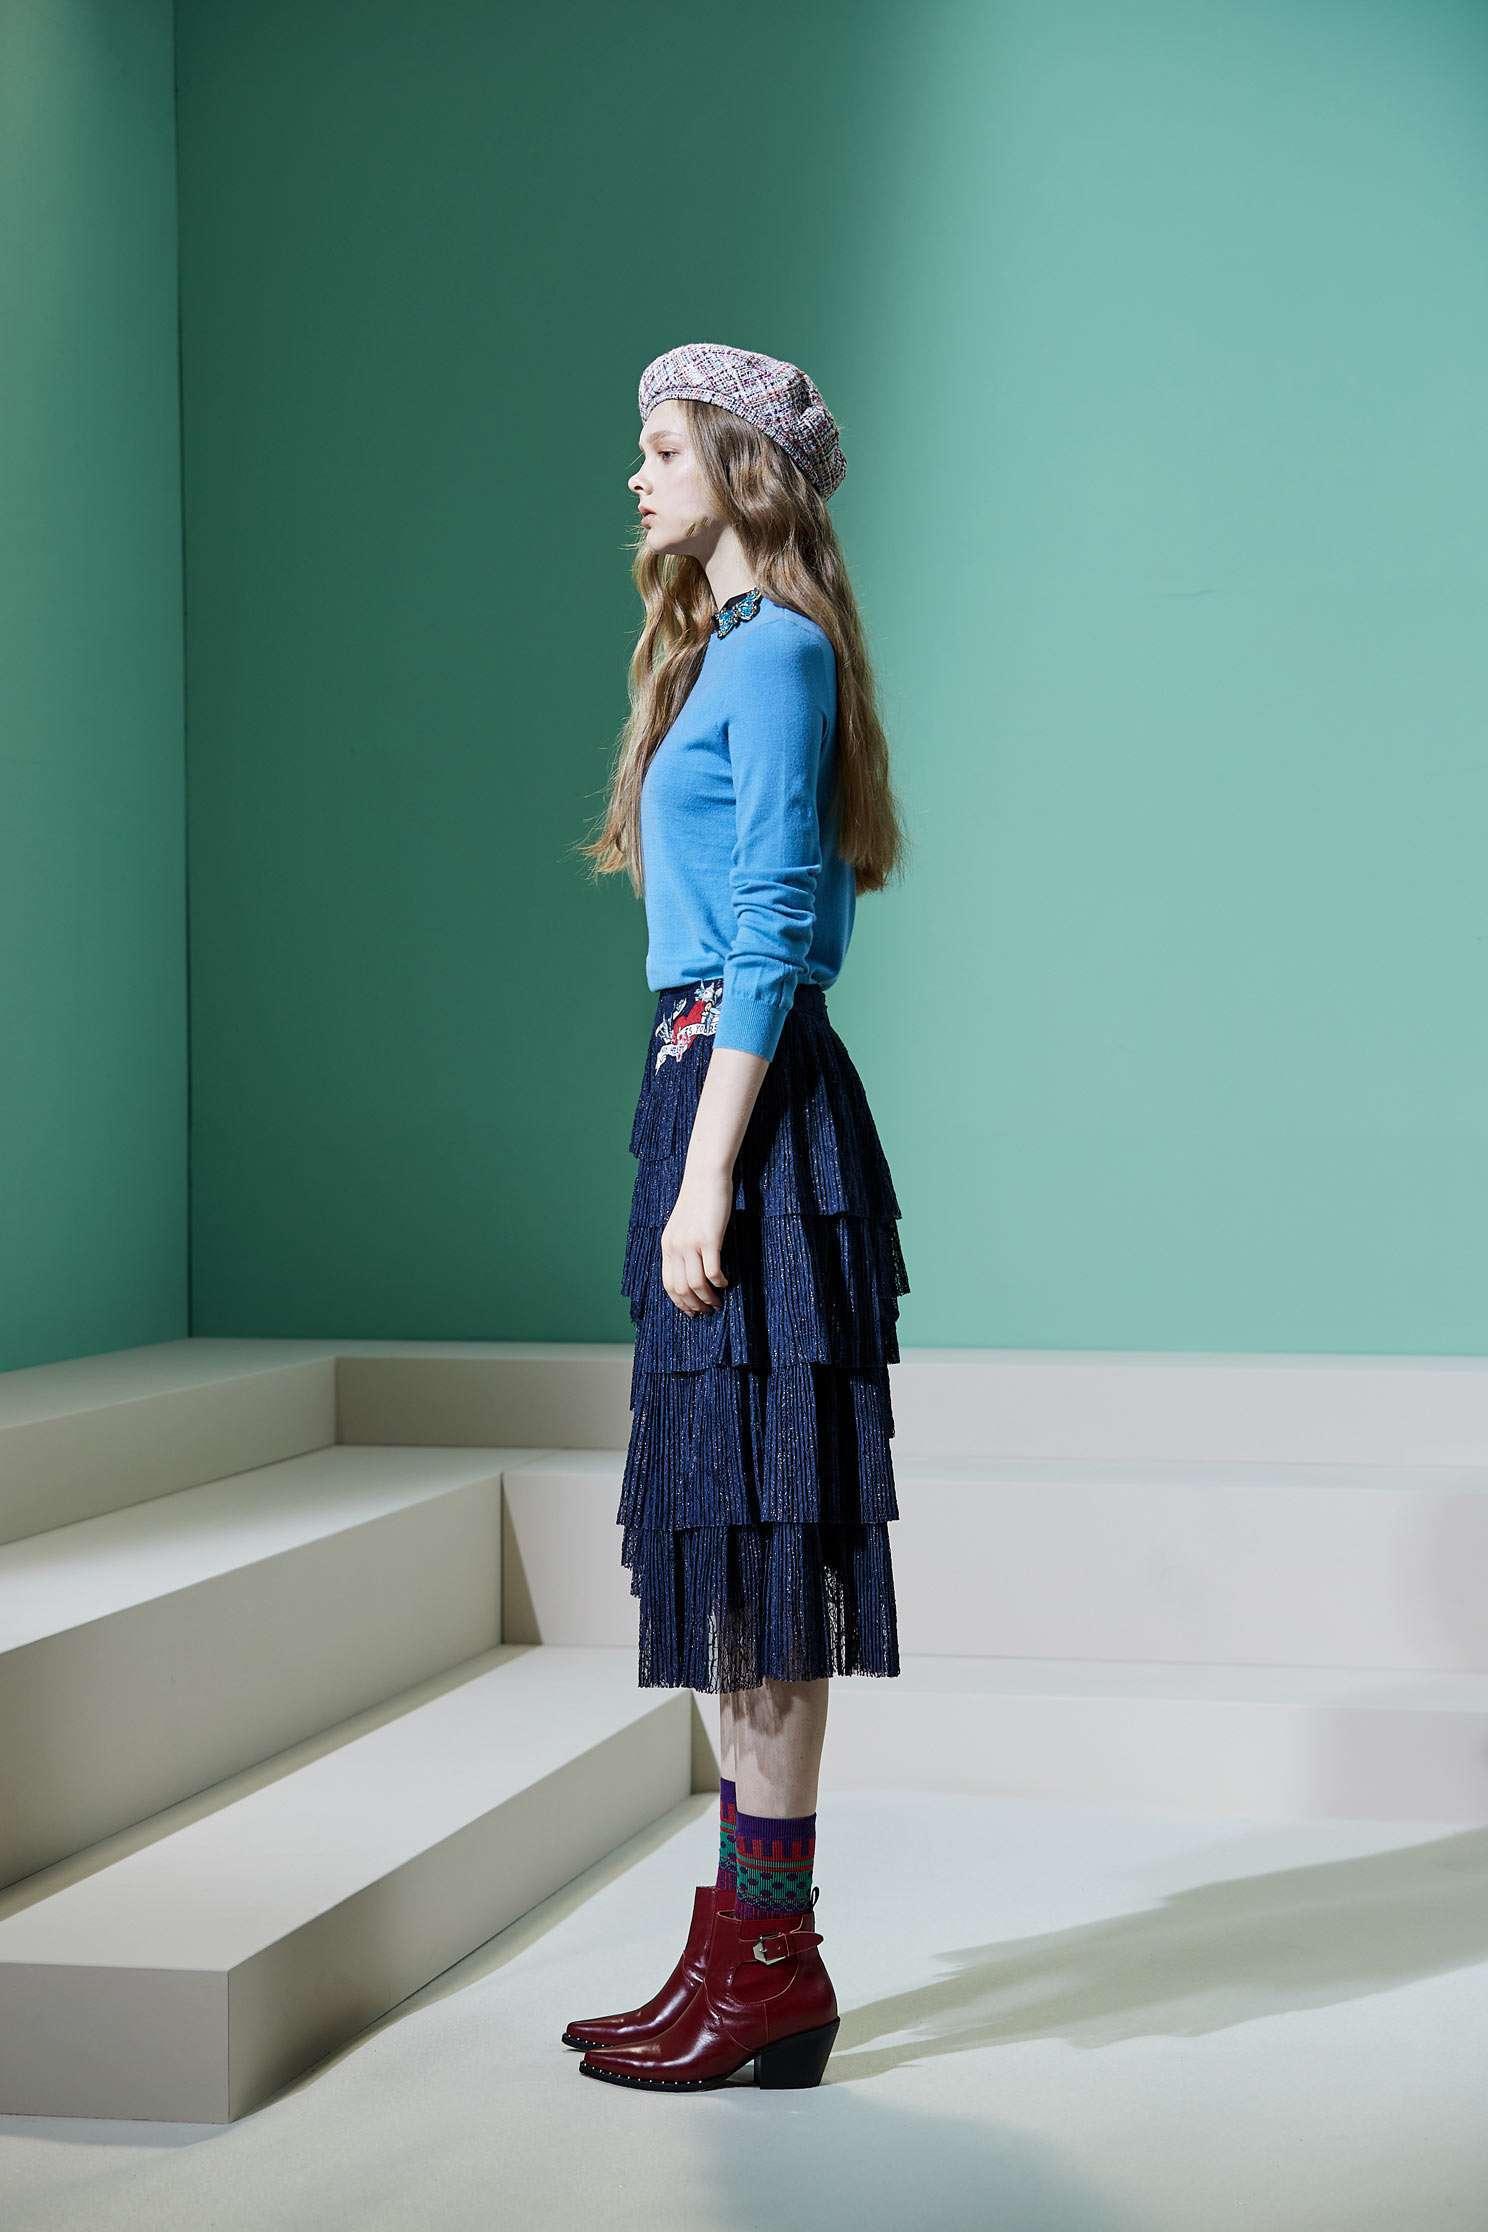 Butterfly rhinestone knitting top,pantoneblue,top,outerwear,knitting,knittedtop,knittedtop,longsleevetop